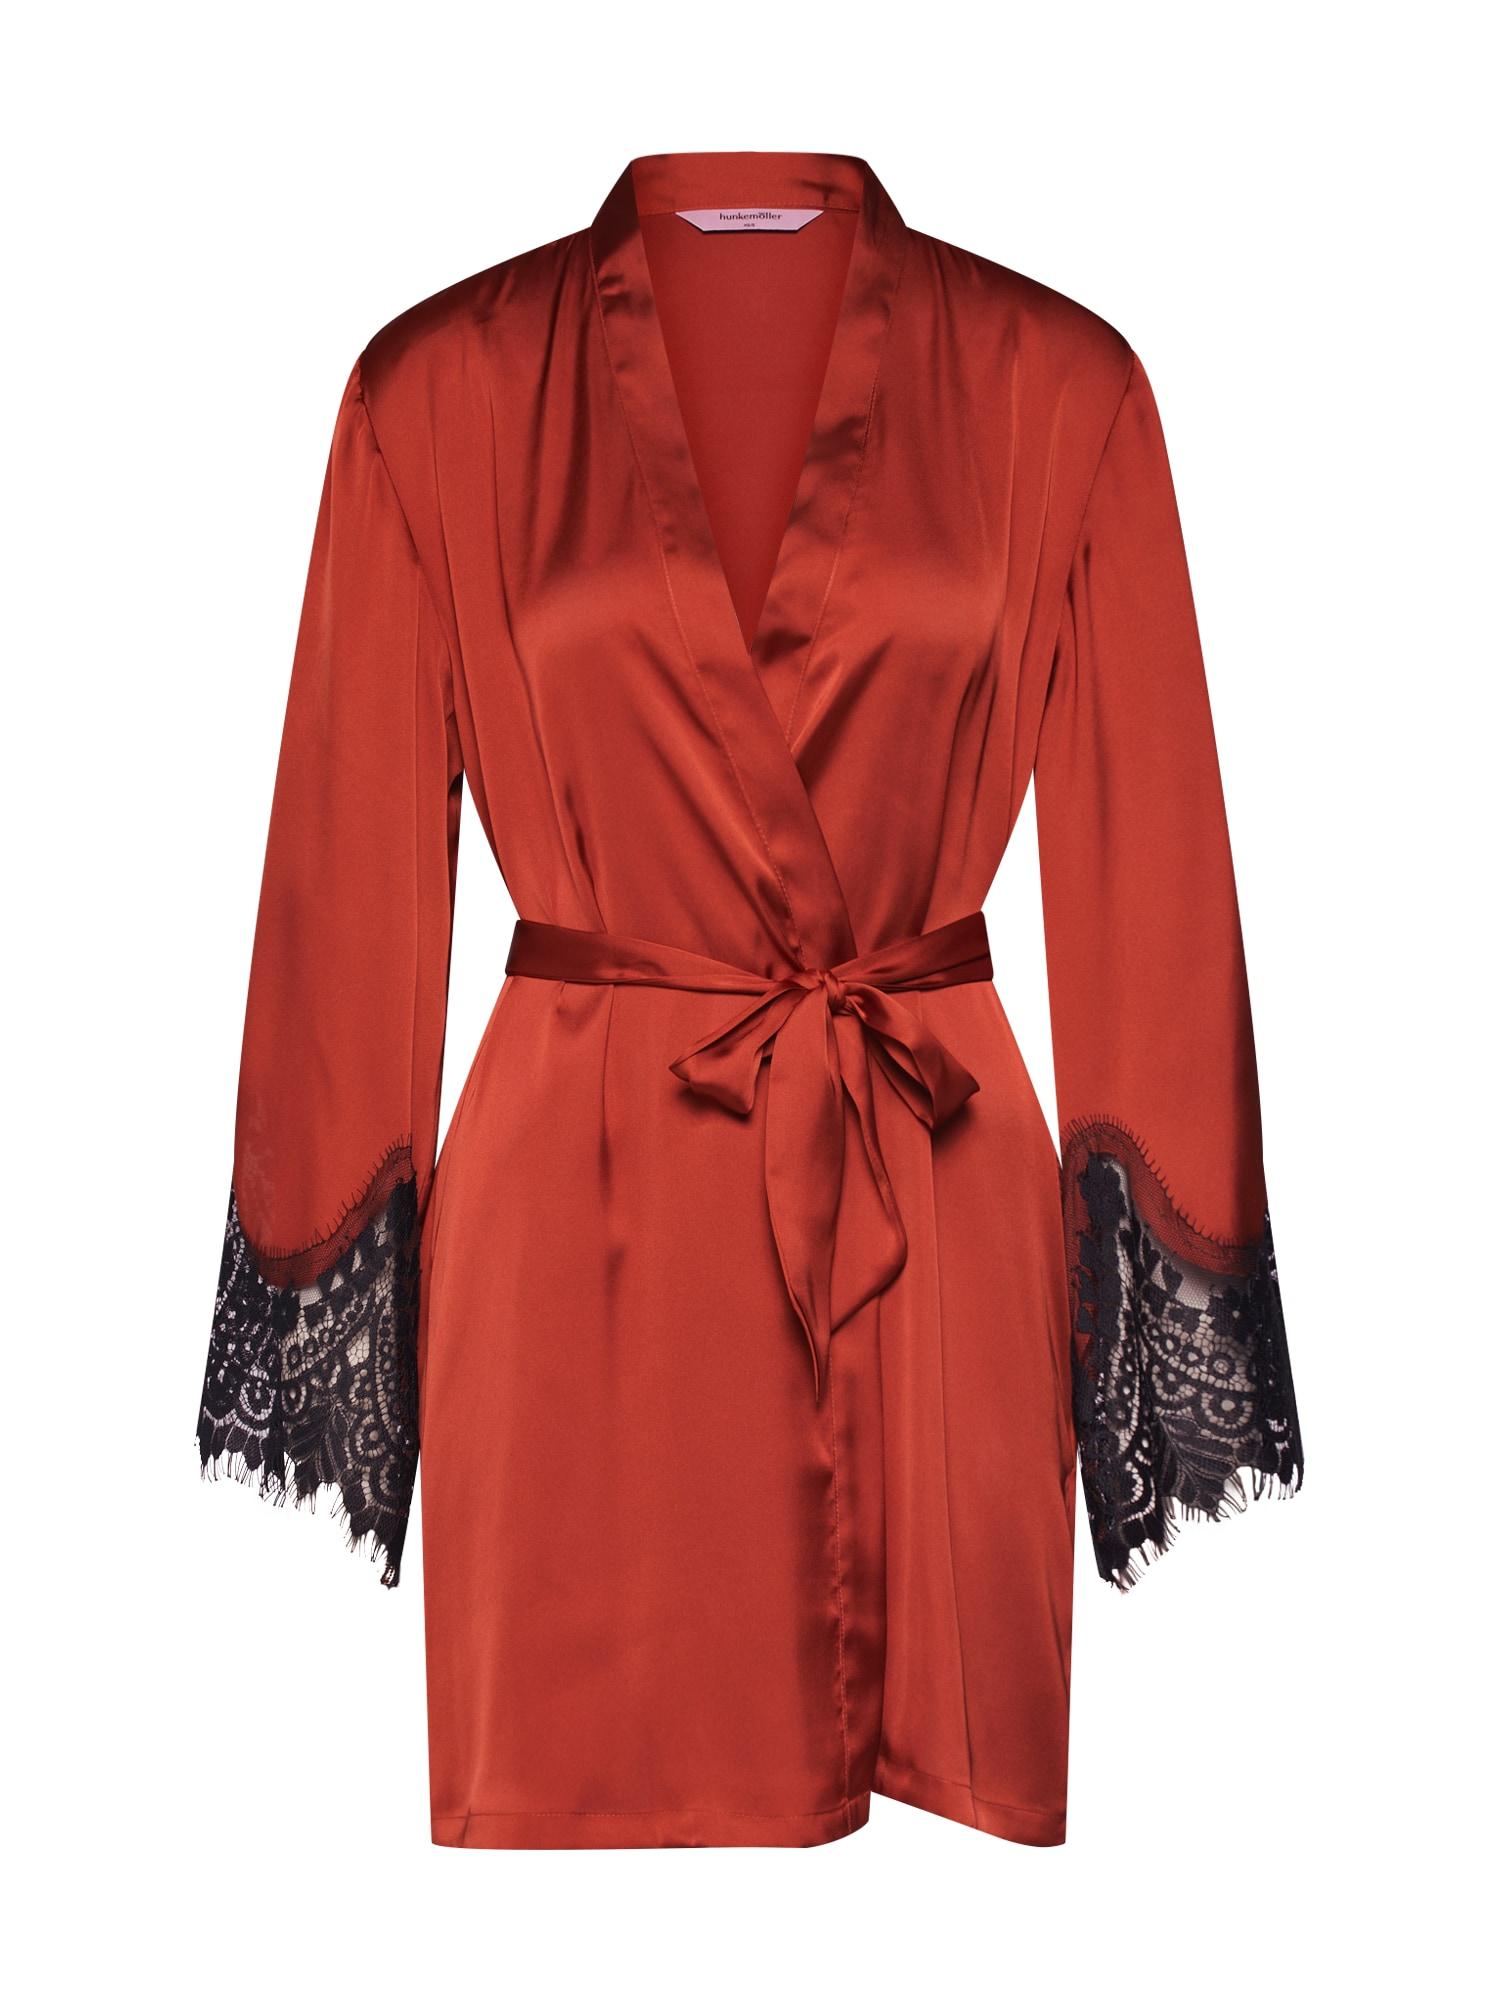 Župan Kimono Satin Big Scallop Lace oranžová Hunkemöller